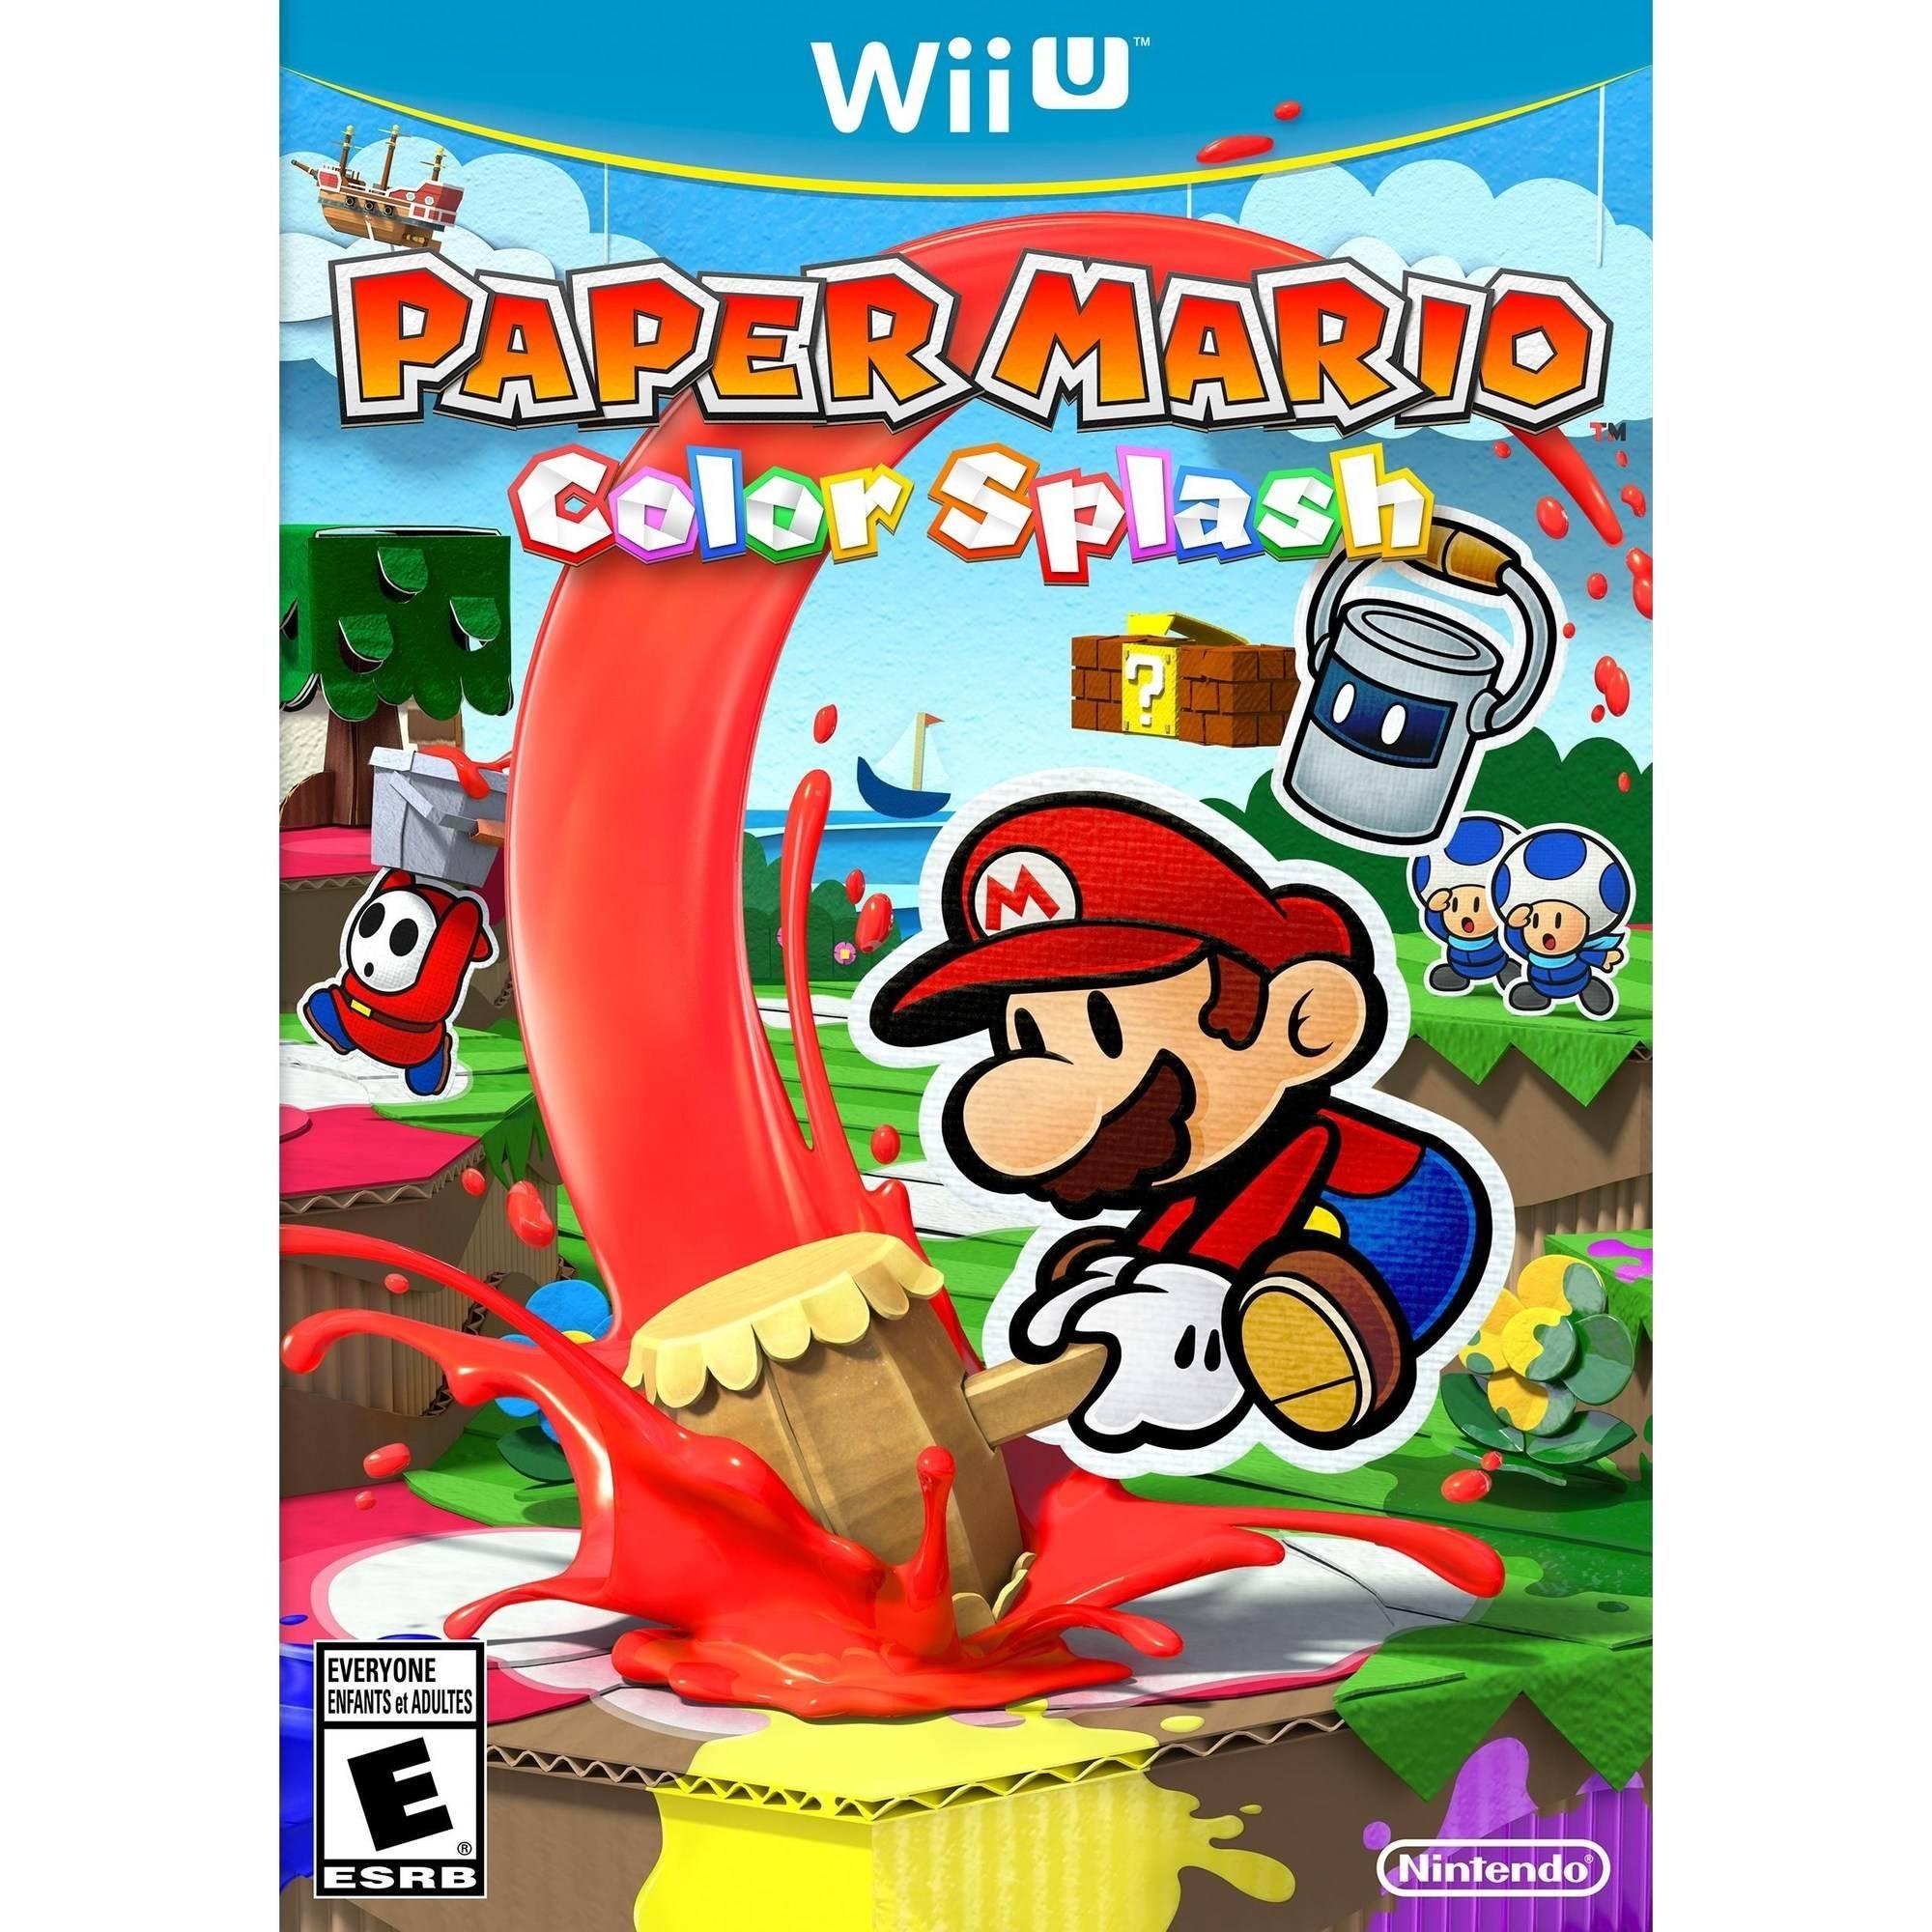 Paper Mario: Color Splash - Pre-Owned (Wii U)